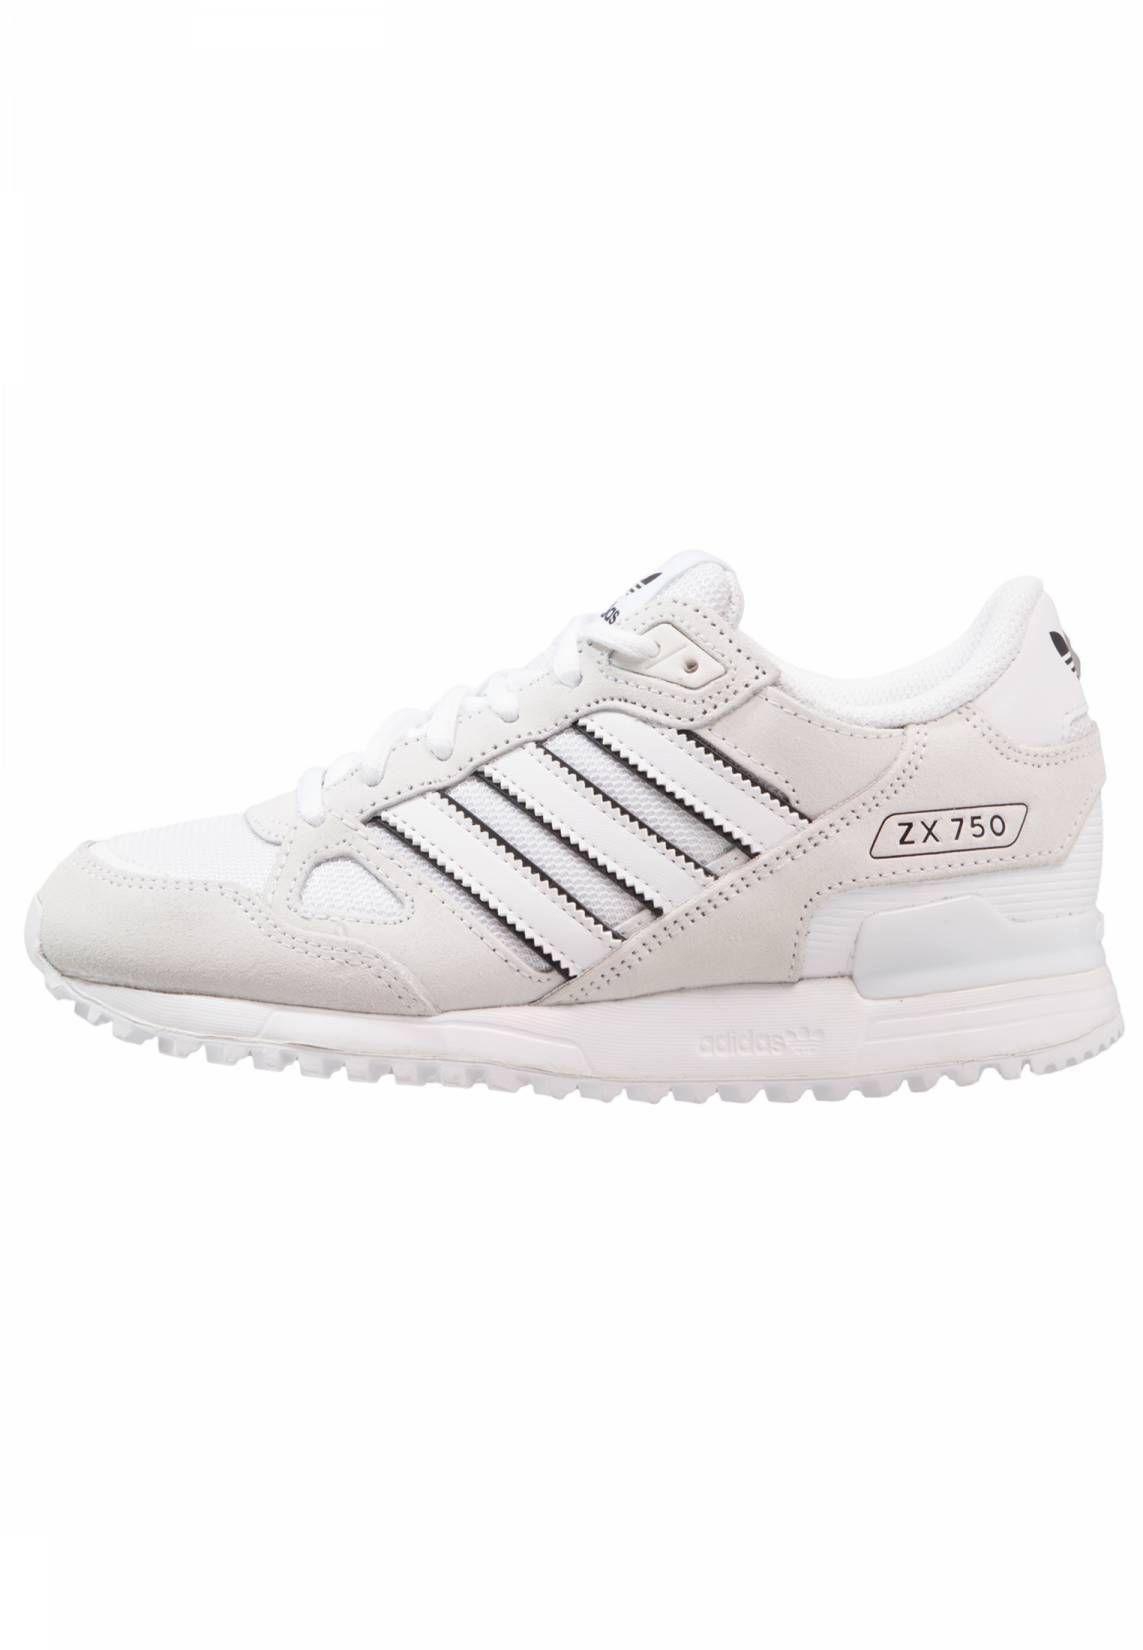 adidas Originals. ZX 750 - Sneakers